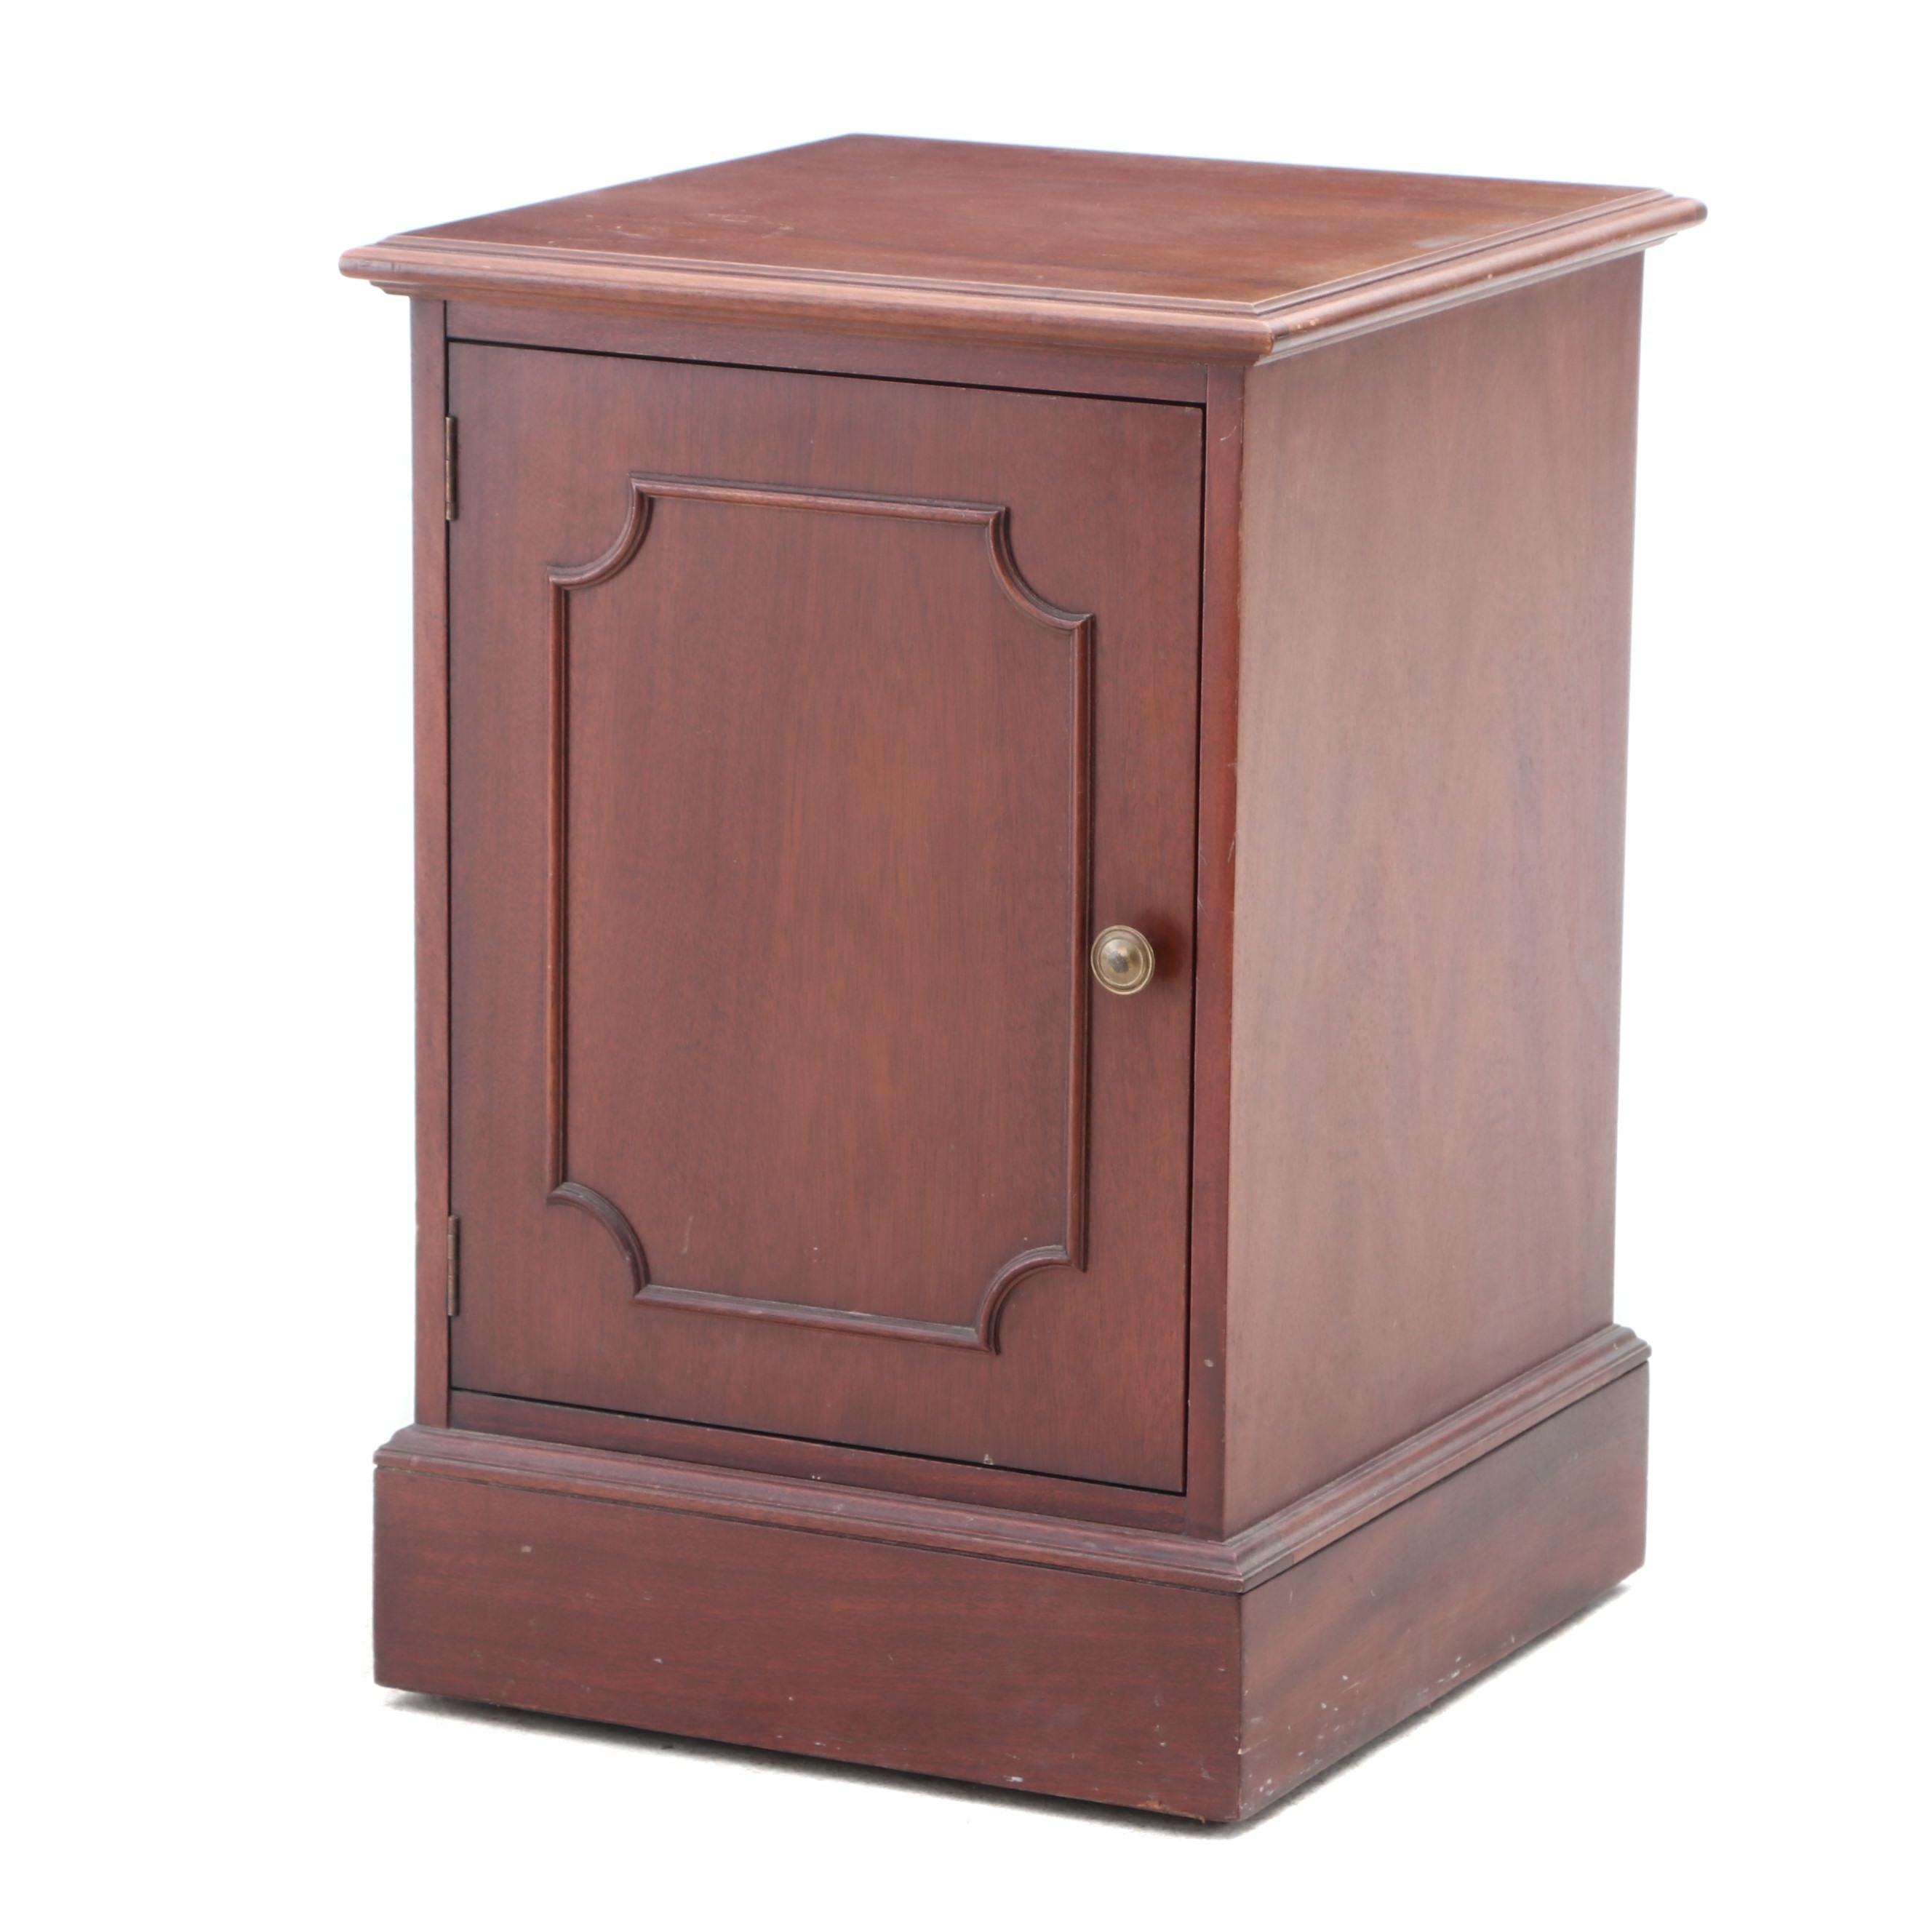 George III Style Mahogany Cabinet